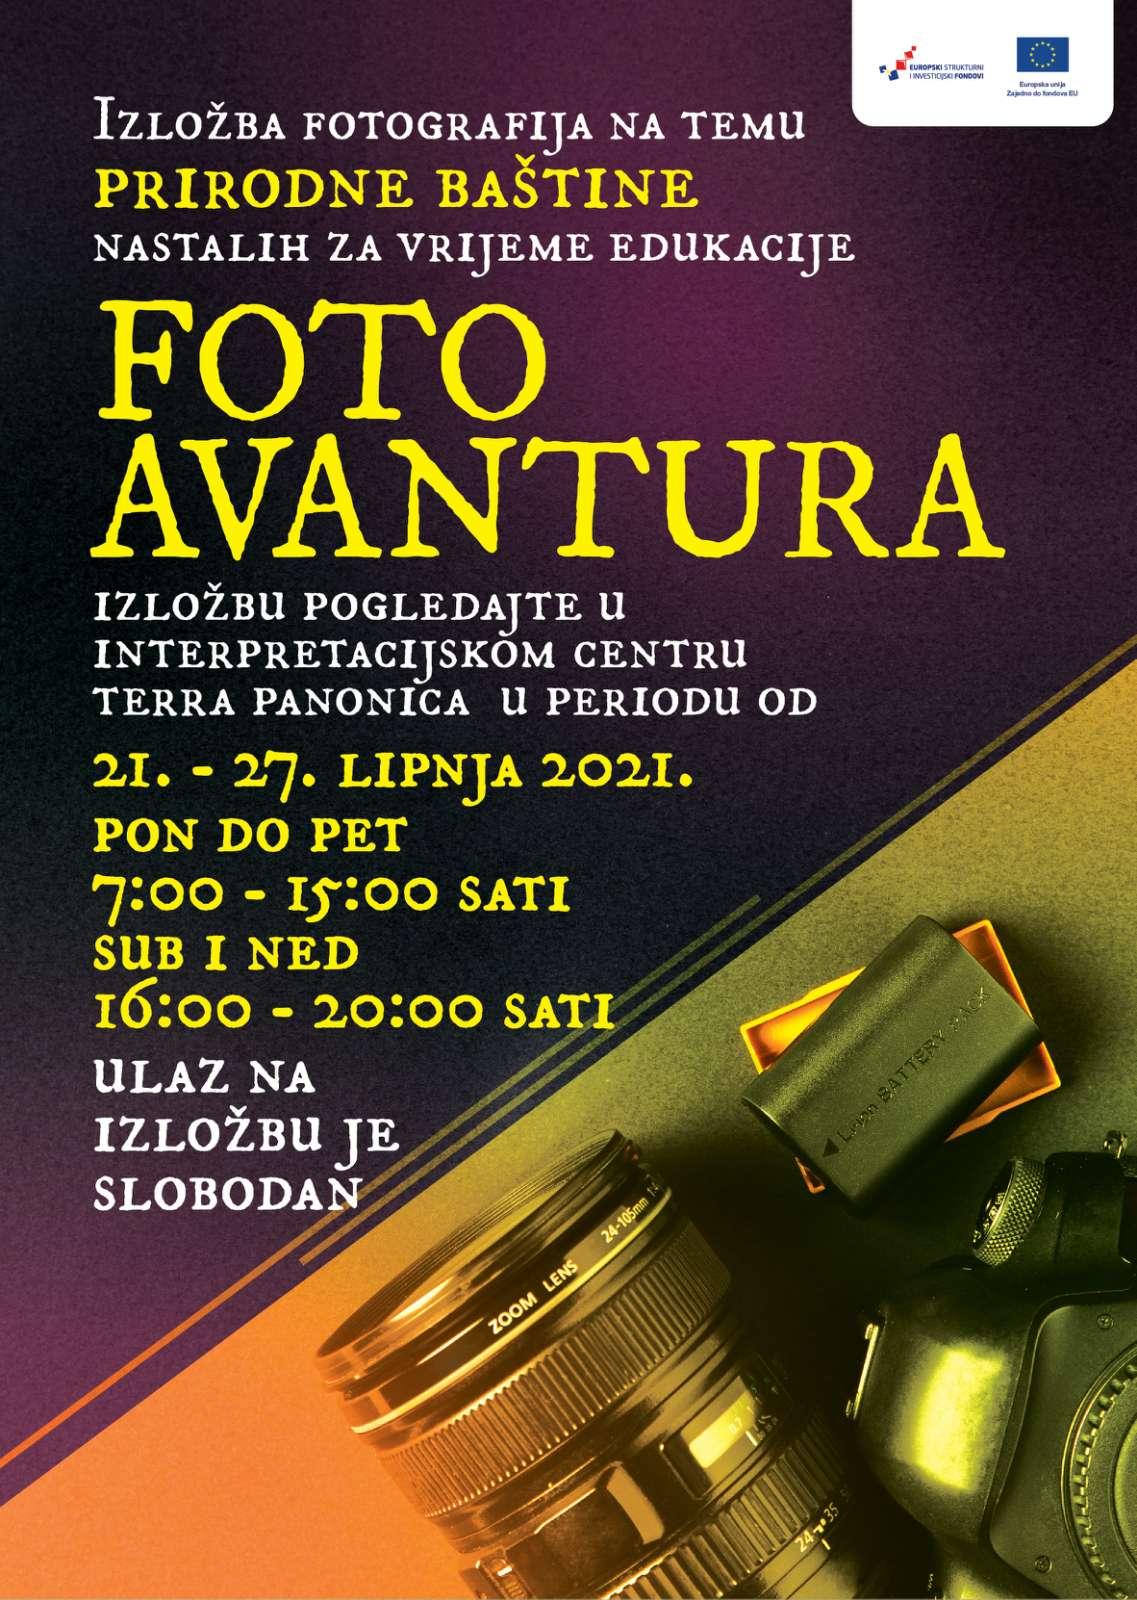 Izložba fotografija sudionika Foto avanture